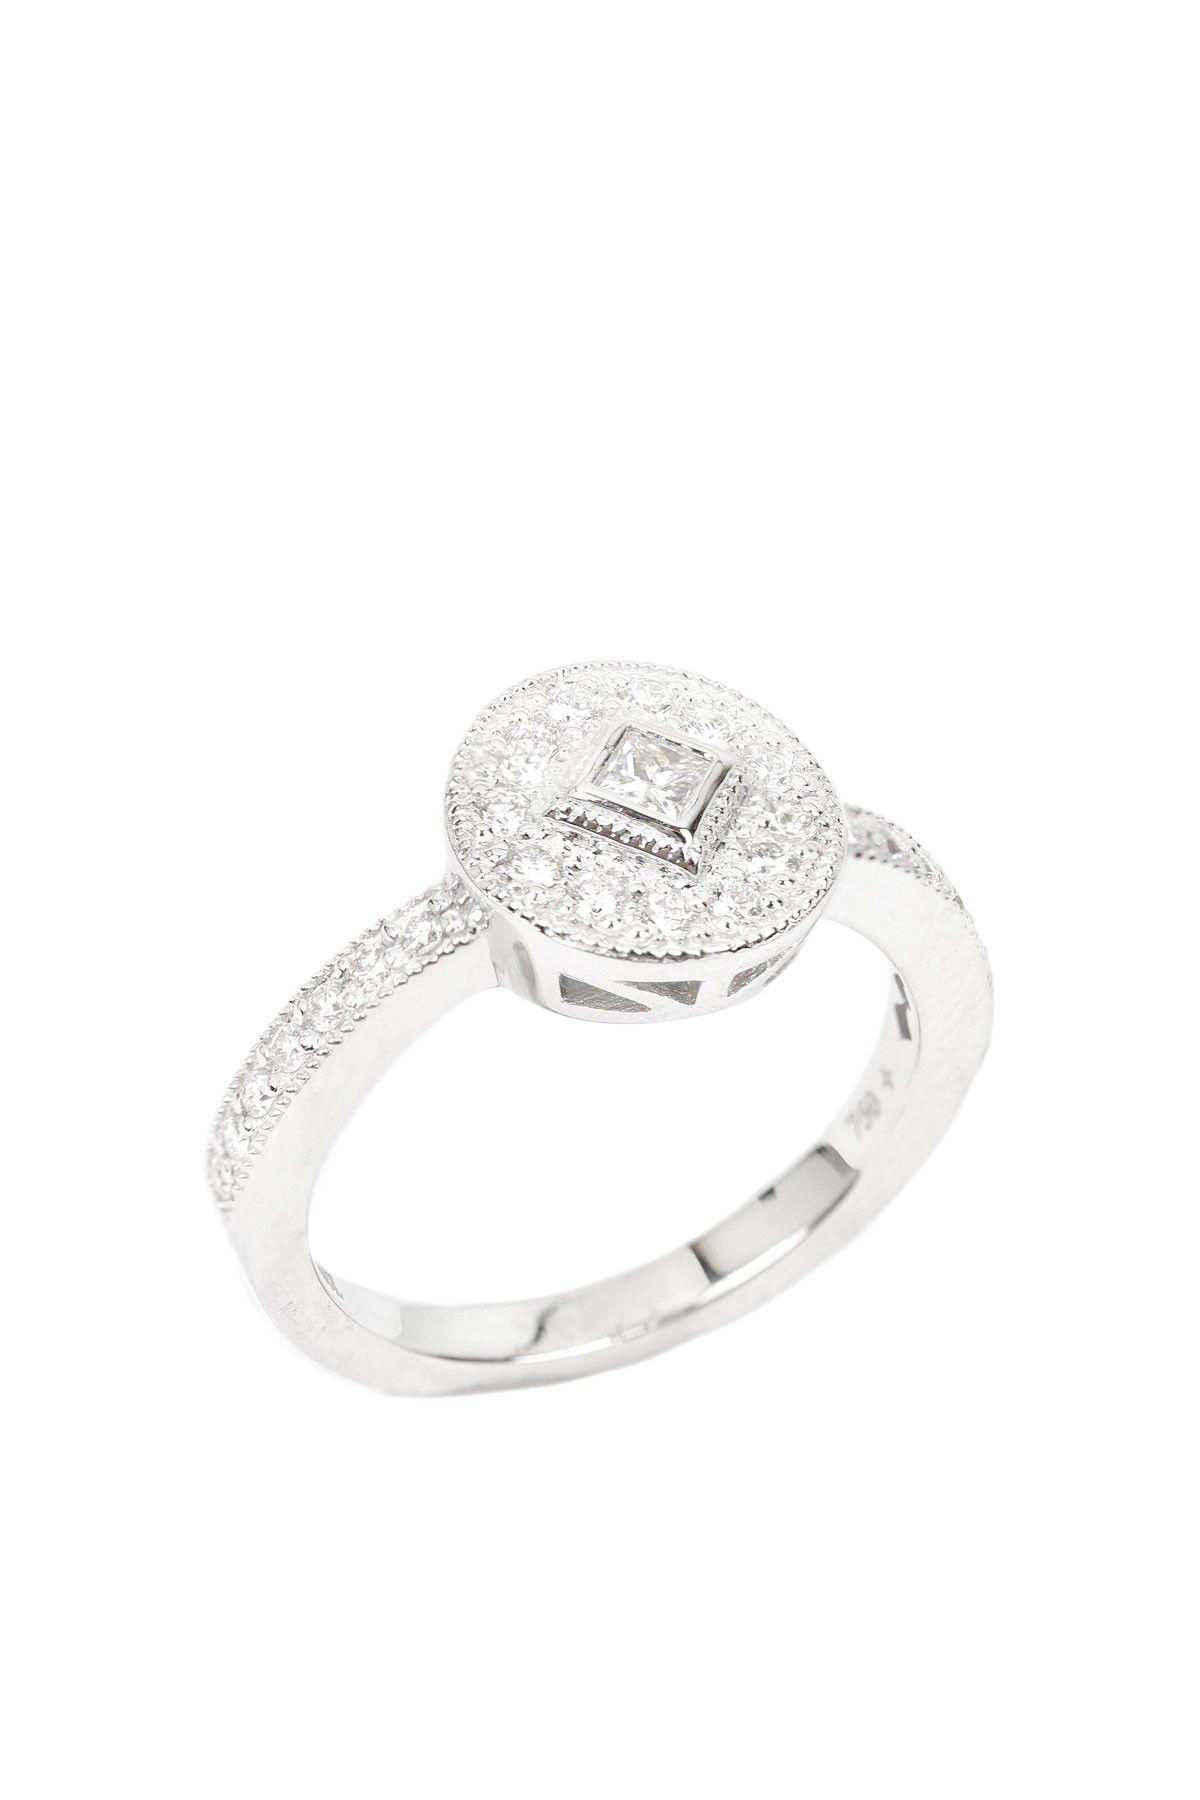 Charriol 18K White Gold Princess Cut & Pave Diamond Round Ring ...